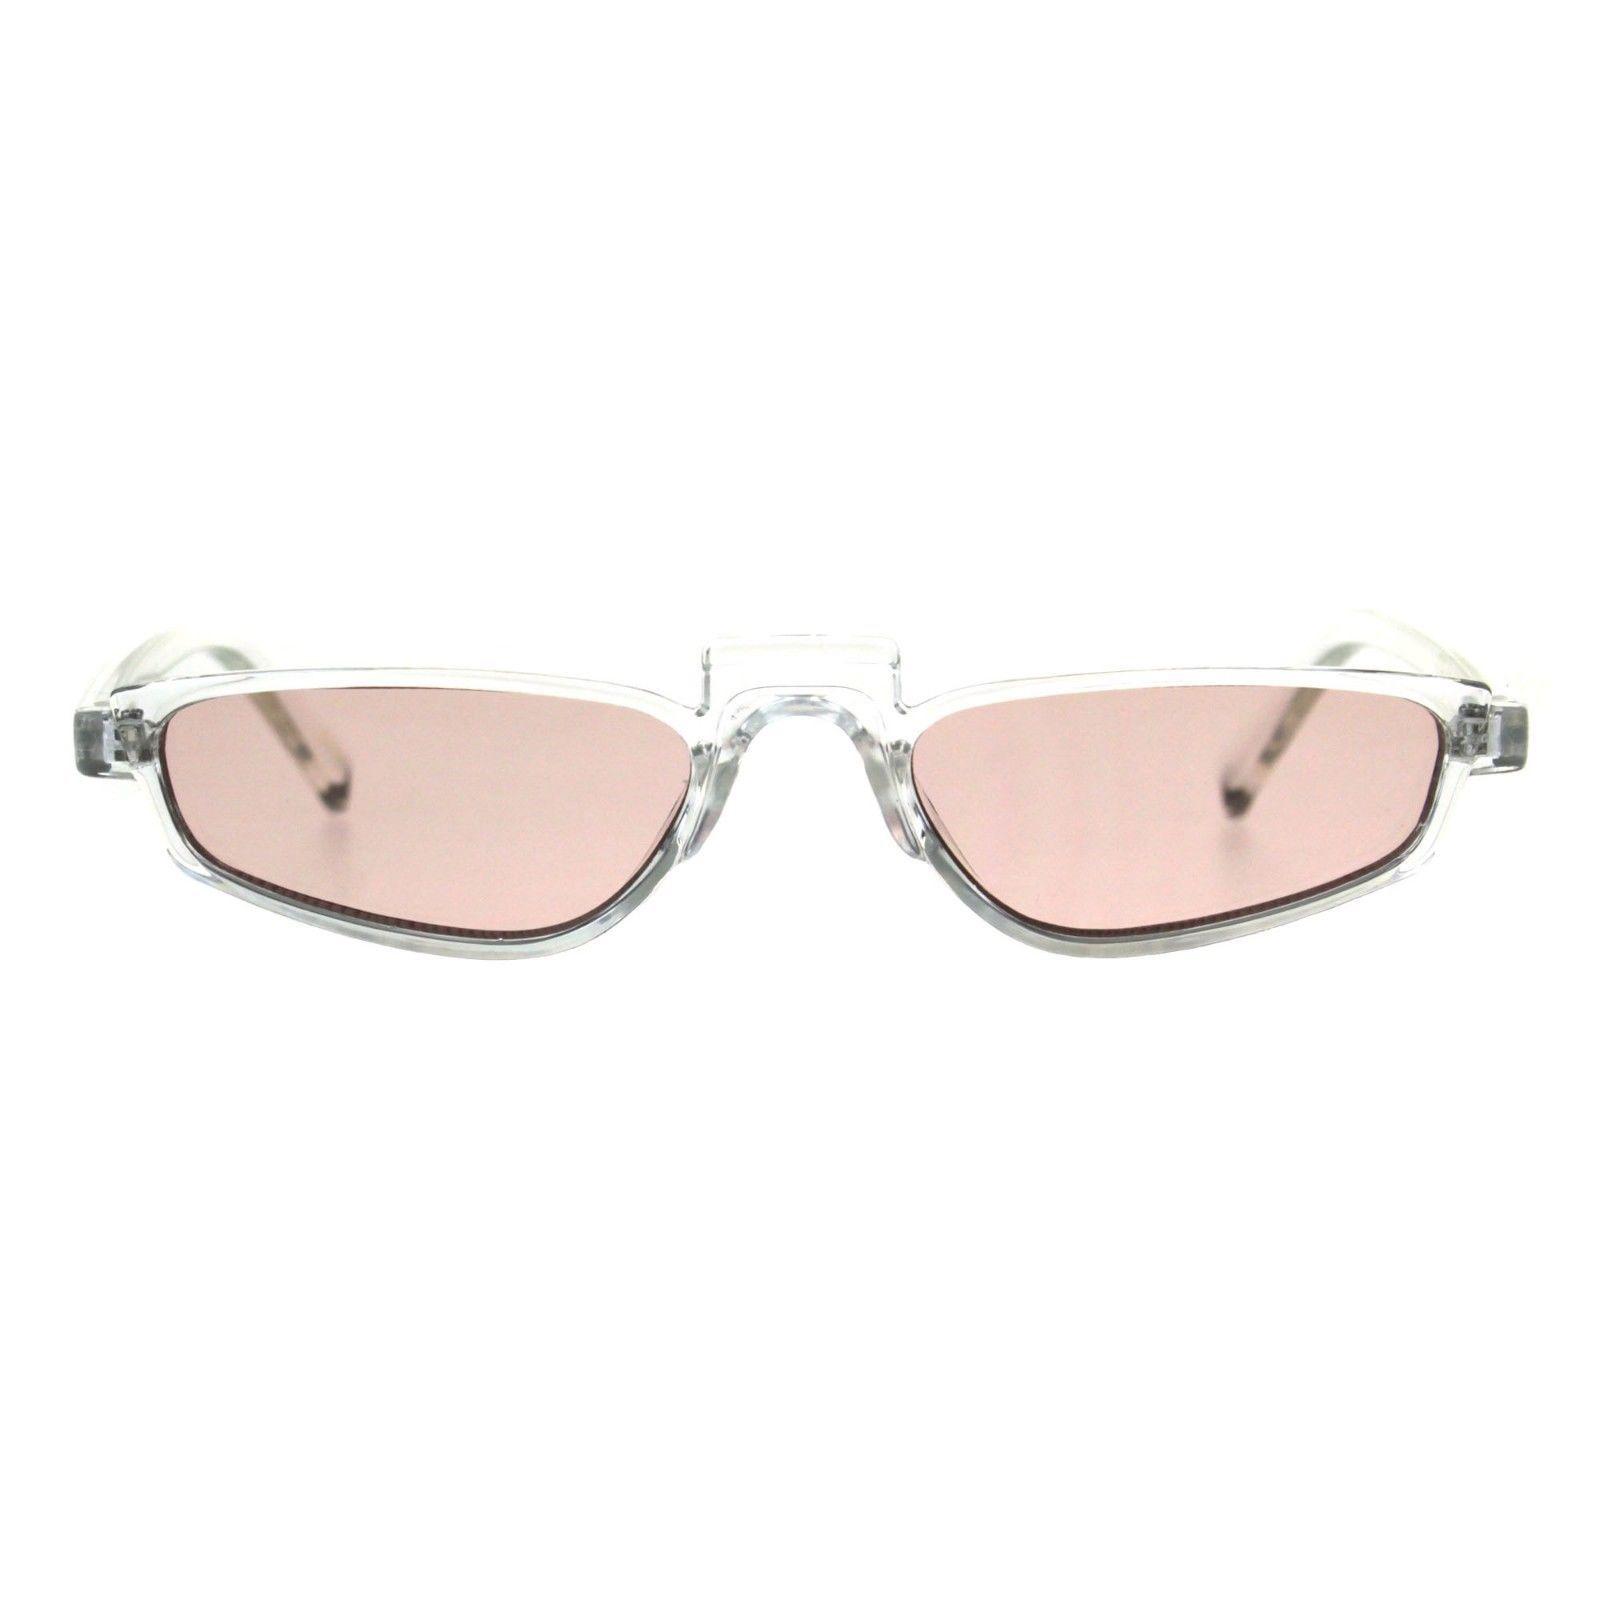 Vintage Fashion Sunglasses Unisex Skinny Frame Unique Pop Up Bridge